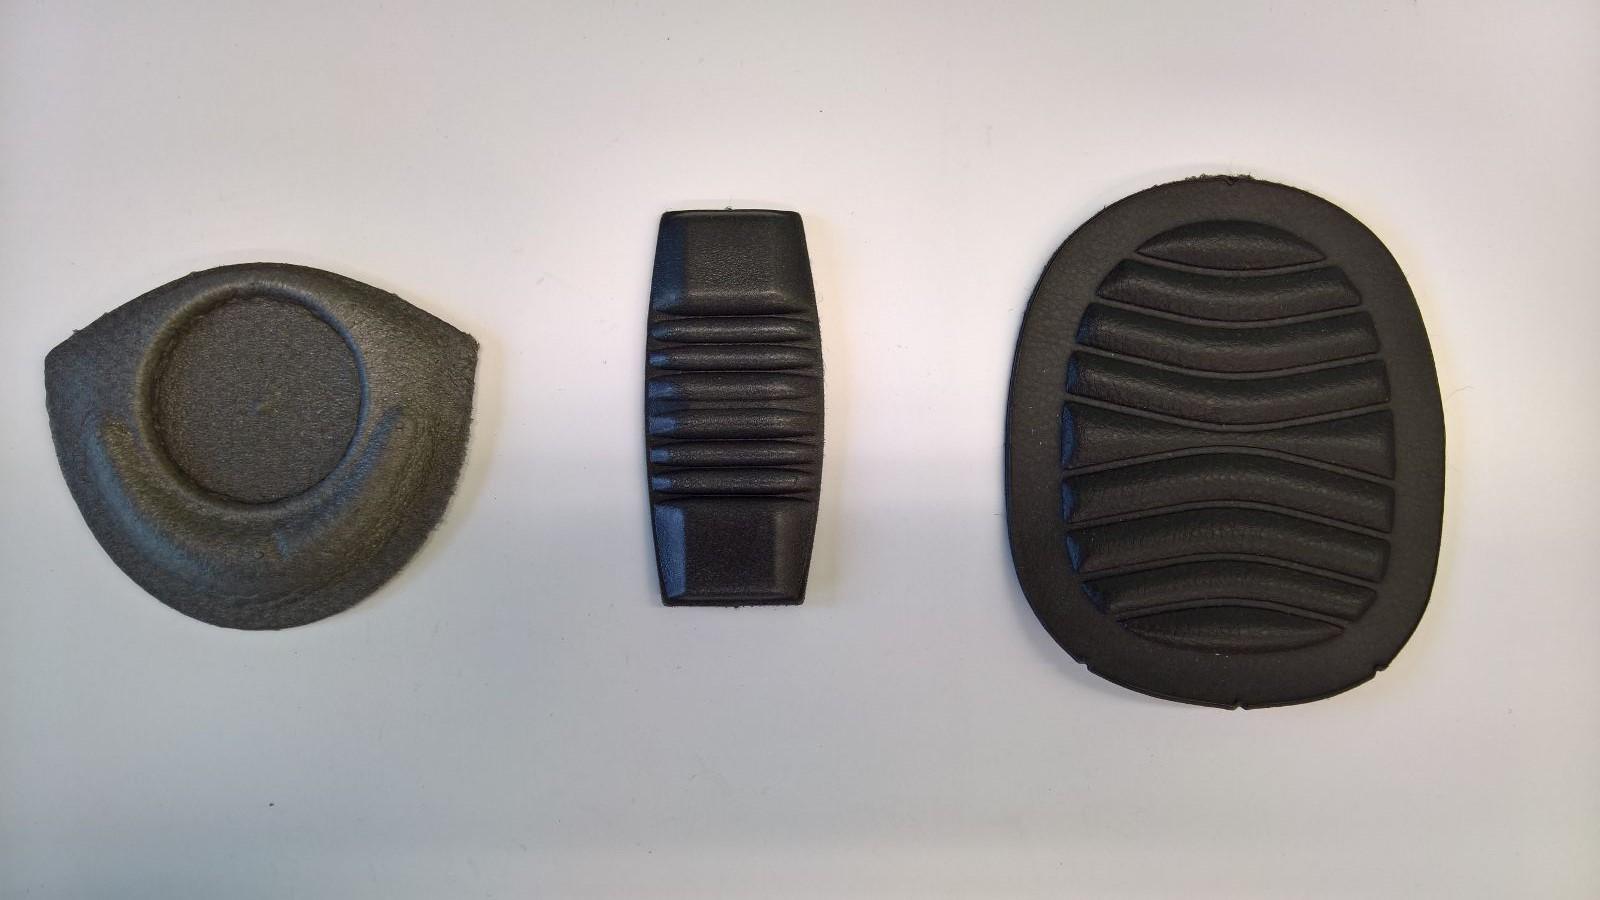 Componenti vari  per scarpe